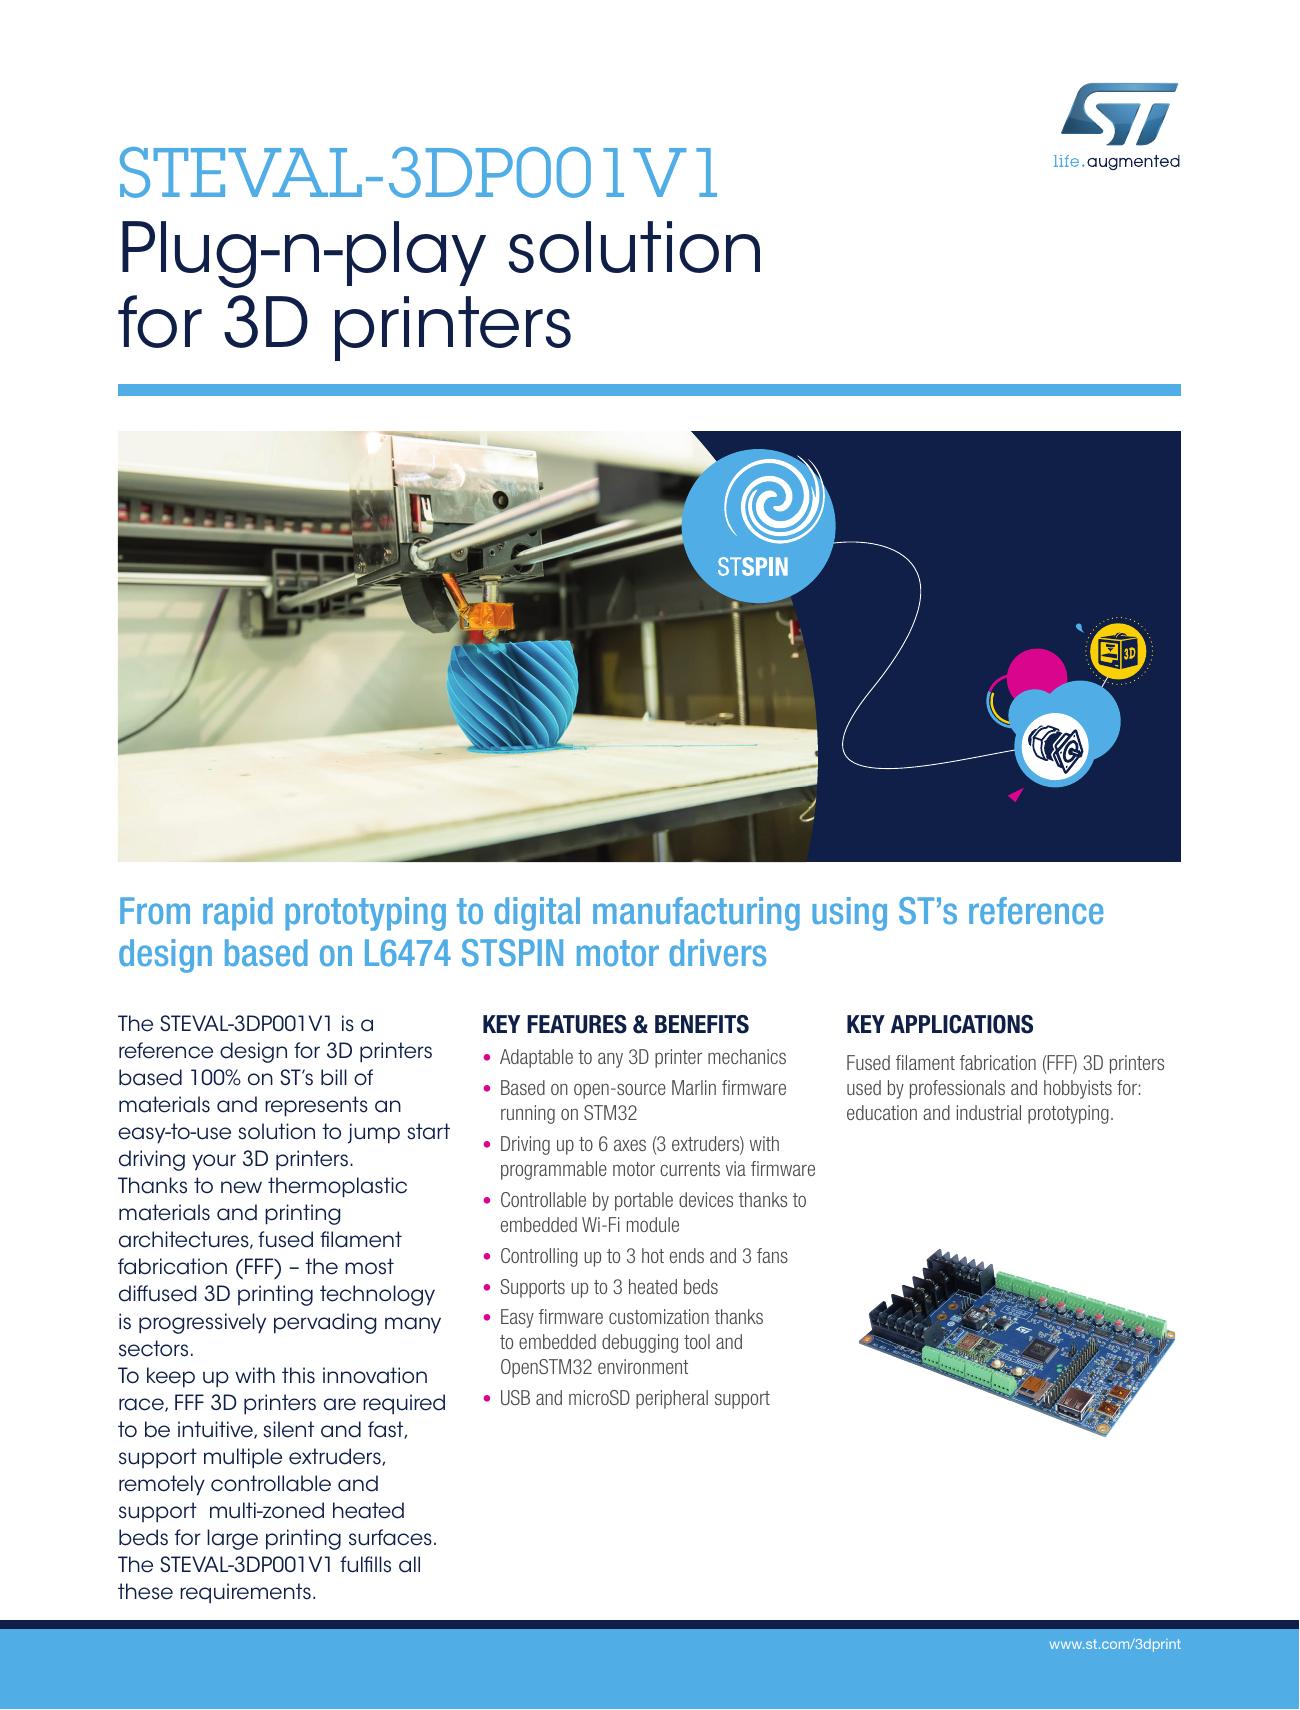 STEVAL-3DP001V1 Plug-n-play solution for 3D printers | manualzz com